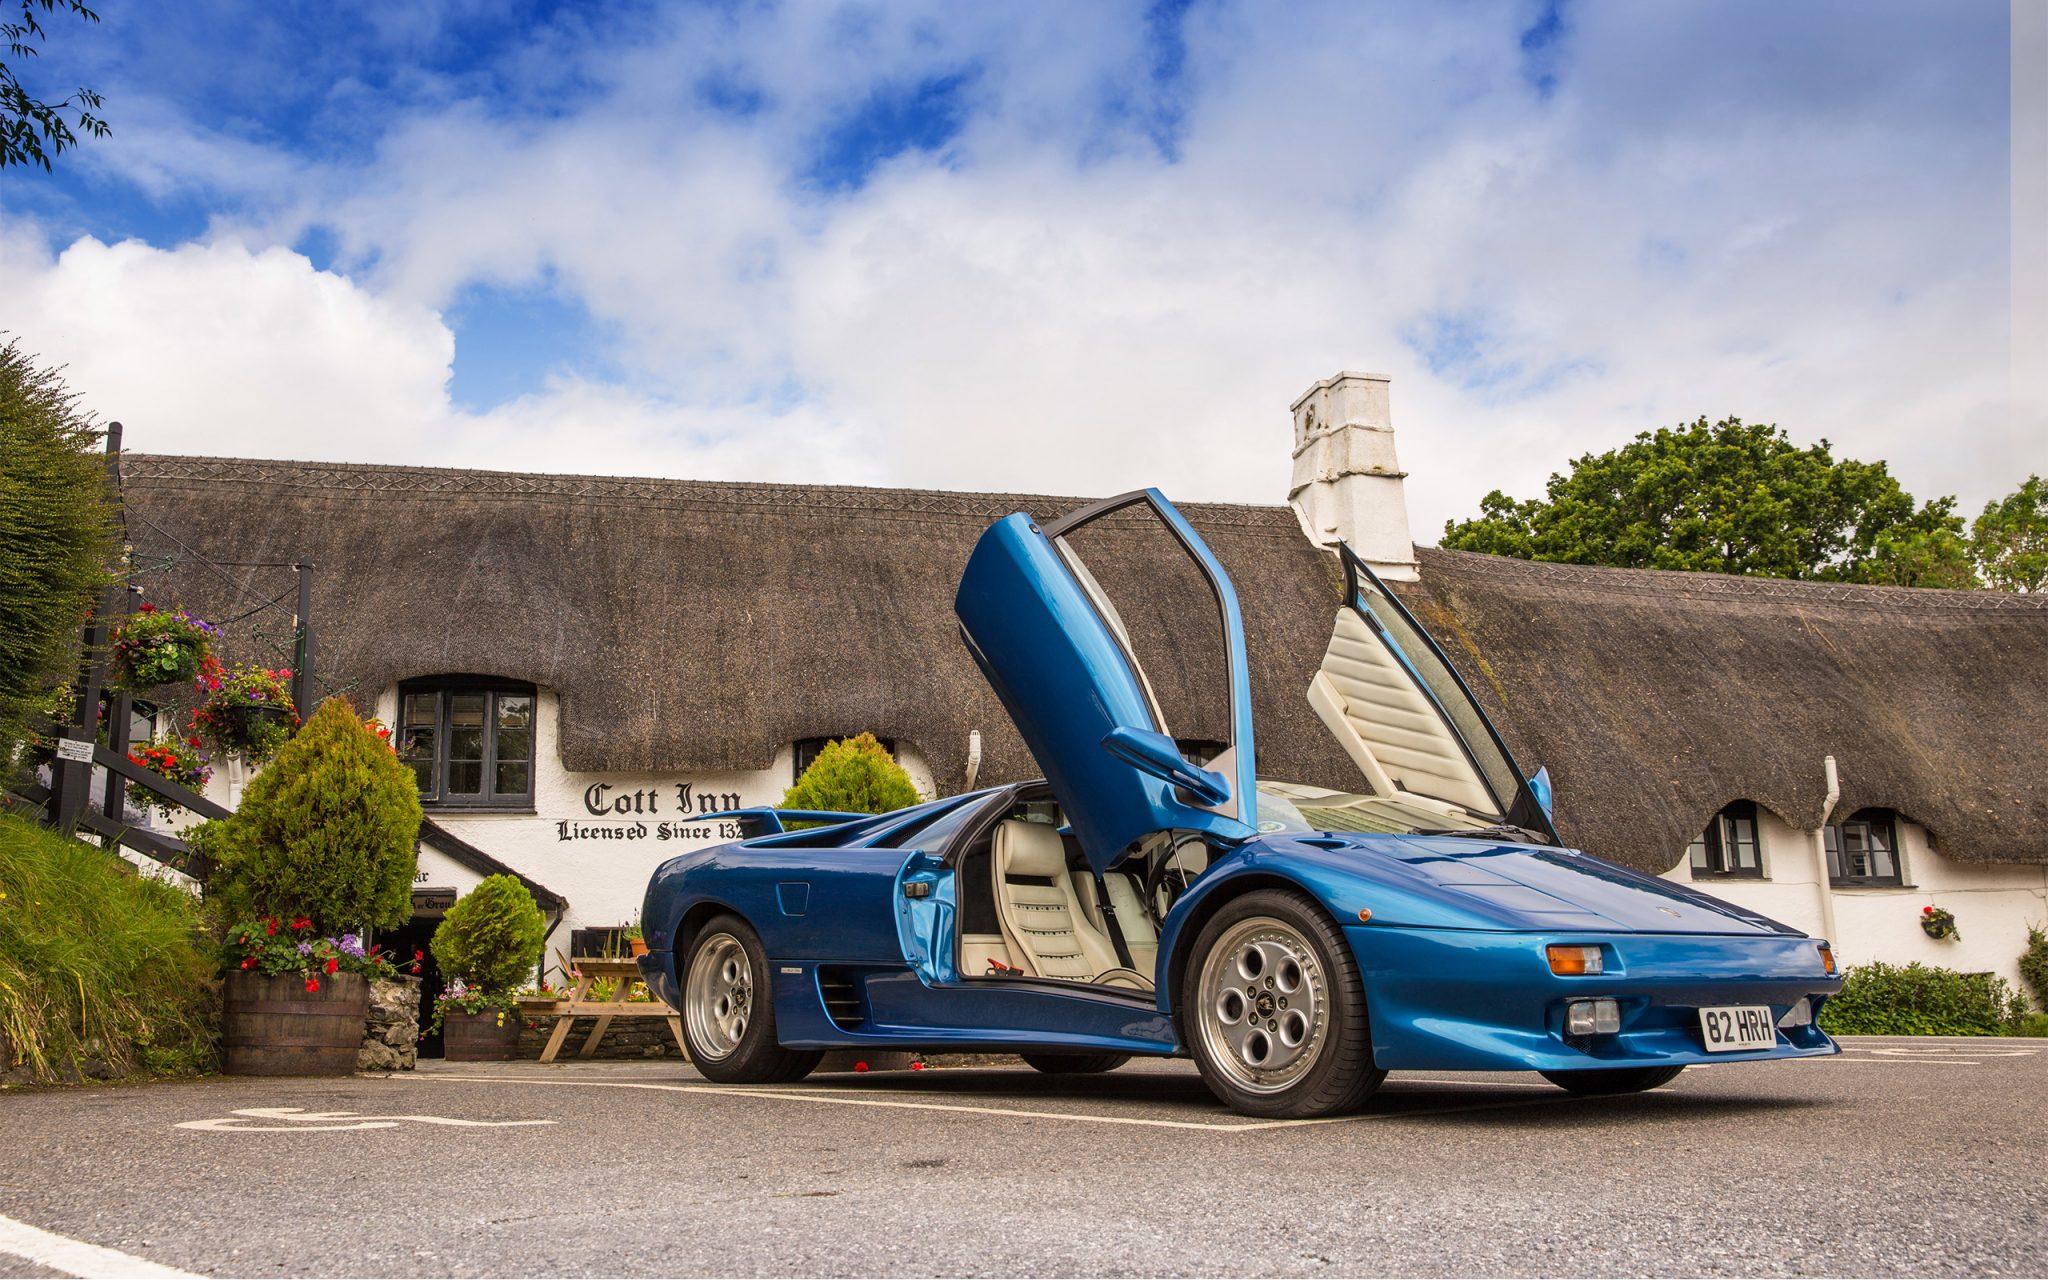 Lamborghini Diablo, Supercar, Cott Inn, Dartington, Devon, English Country Pub, English Country Inn,Winner, Best British Pub, WINNER OF THE GREAT BRITISH PUB AWARDS 2019, Carey Marks Photography